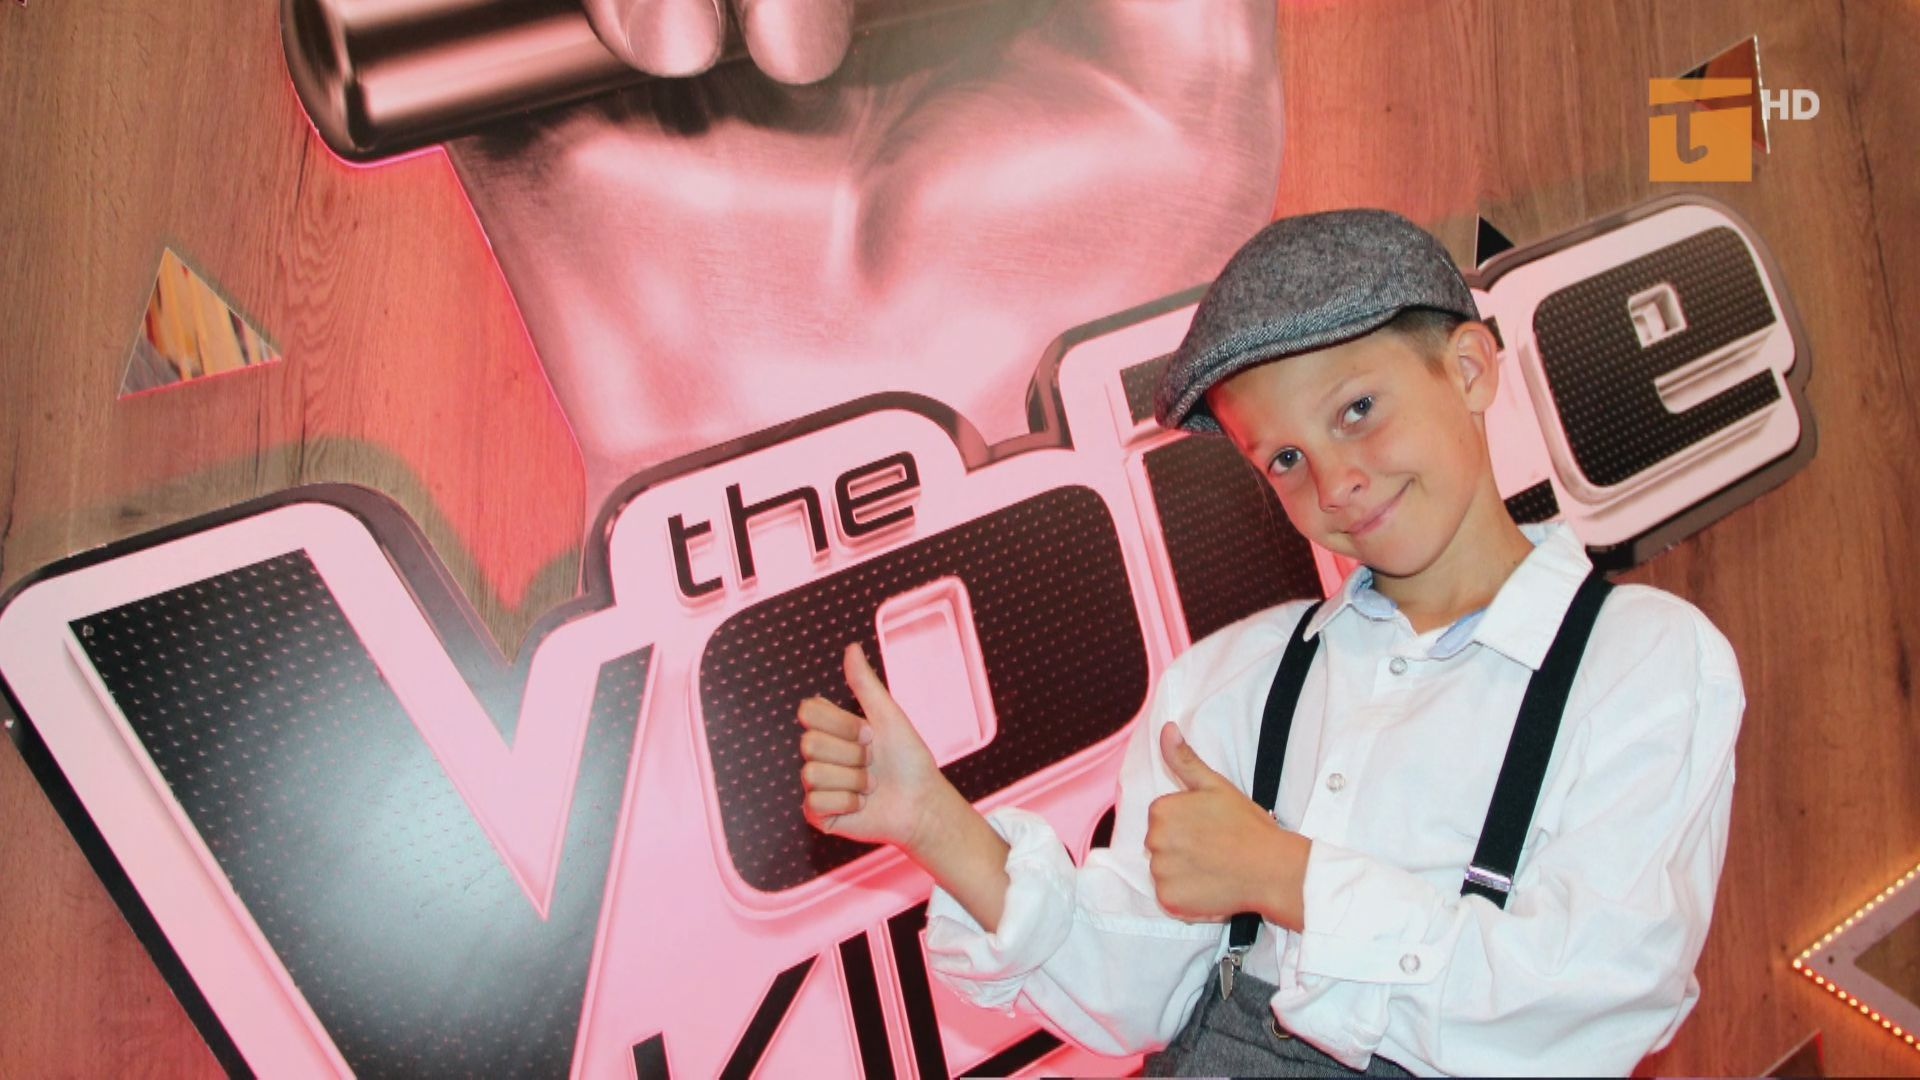 konrad voice kids